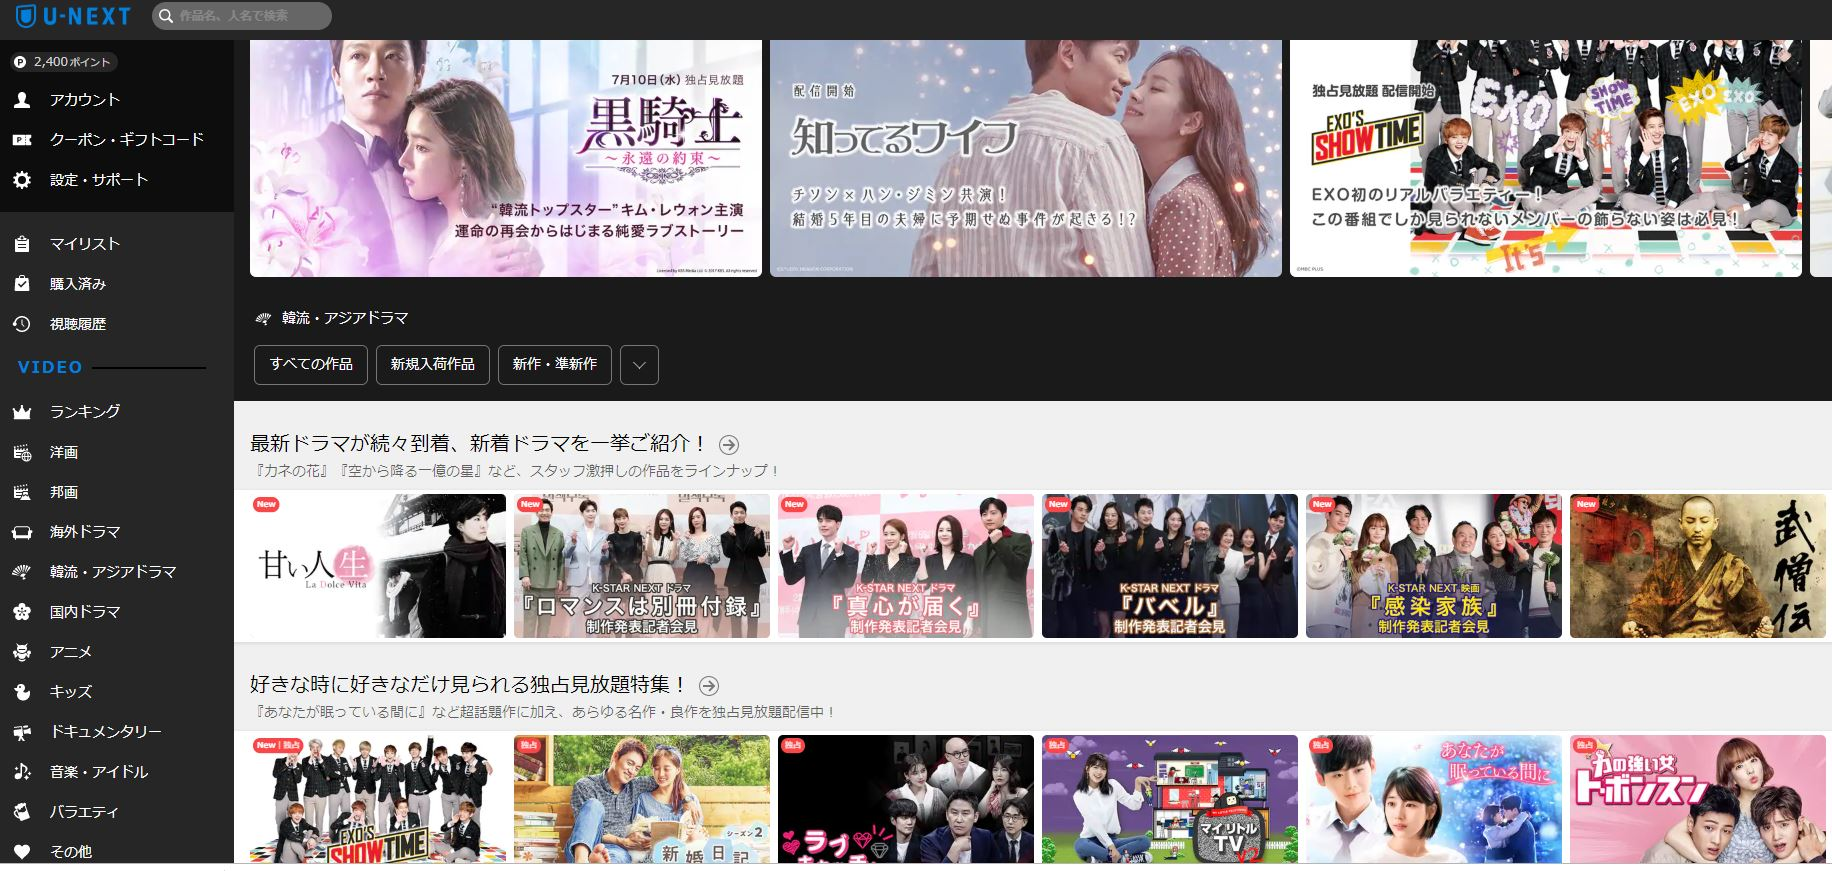 U-NEXTでの韓国ドラマの配信状況